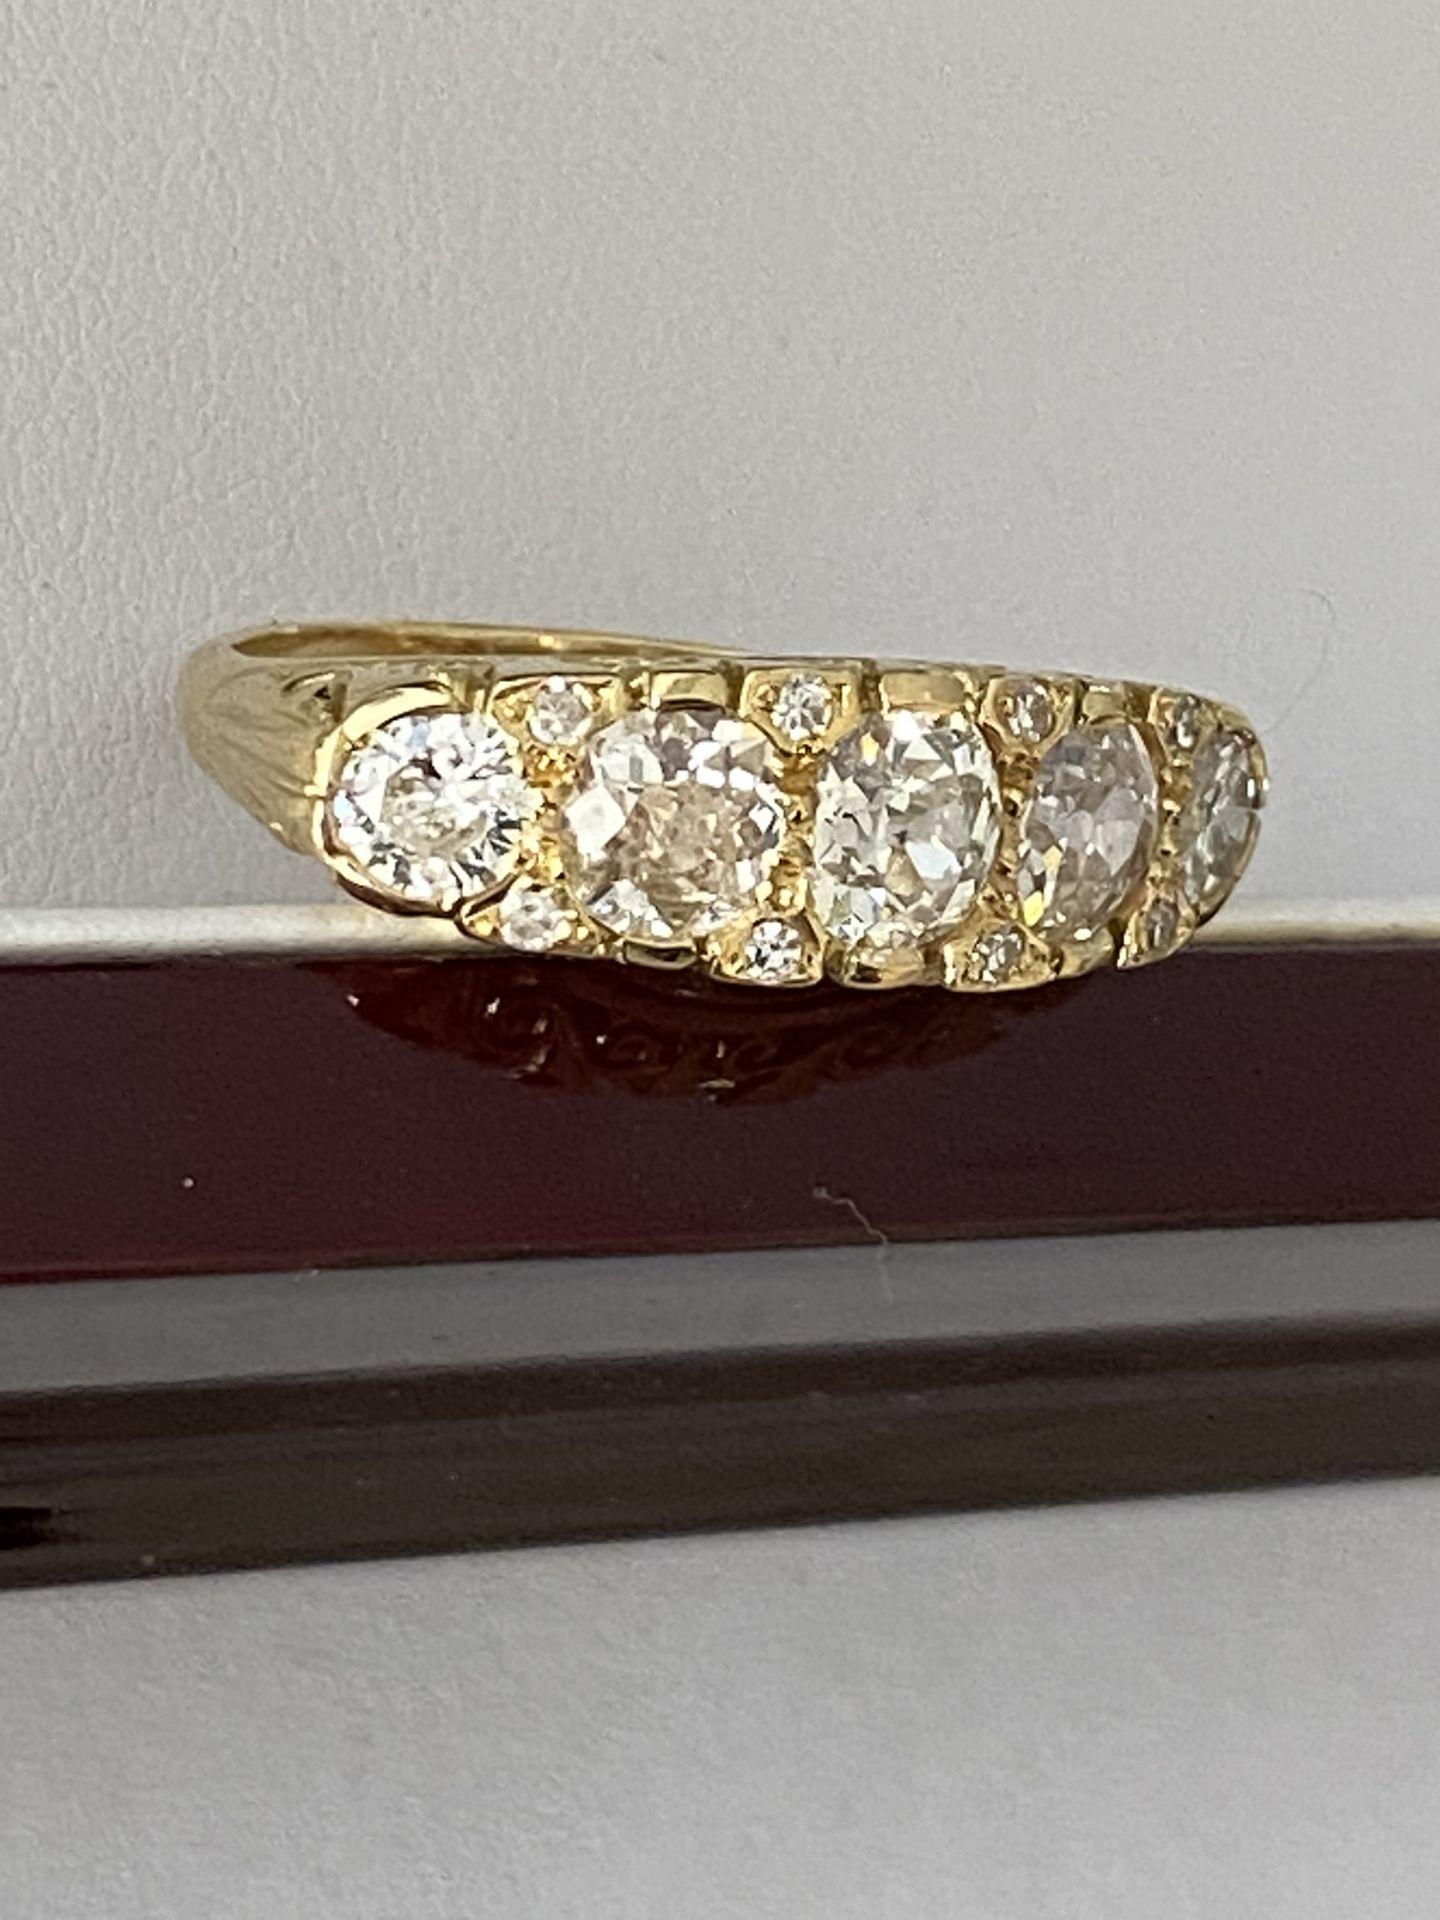 FINE 18ct YELLOW GOLD 2.00ct 5 STONE DIAMOND RING - Image 9 of 15